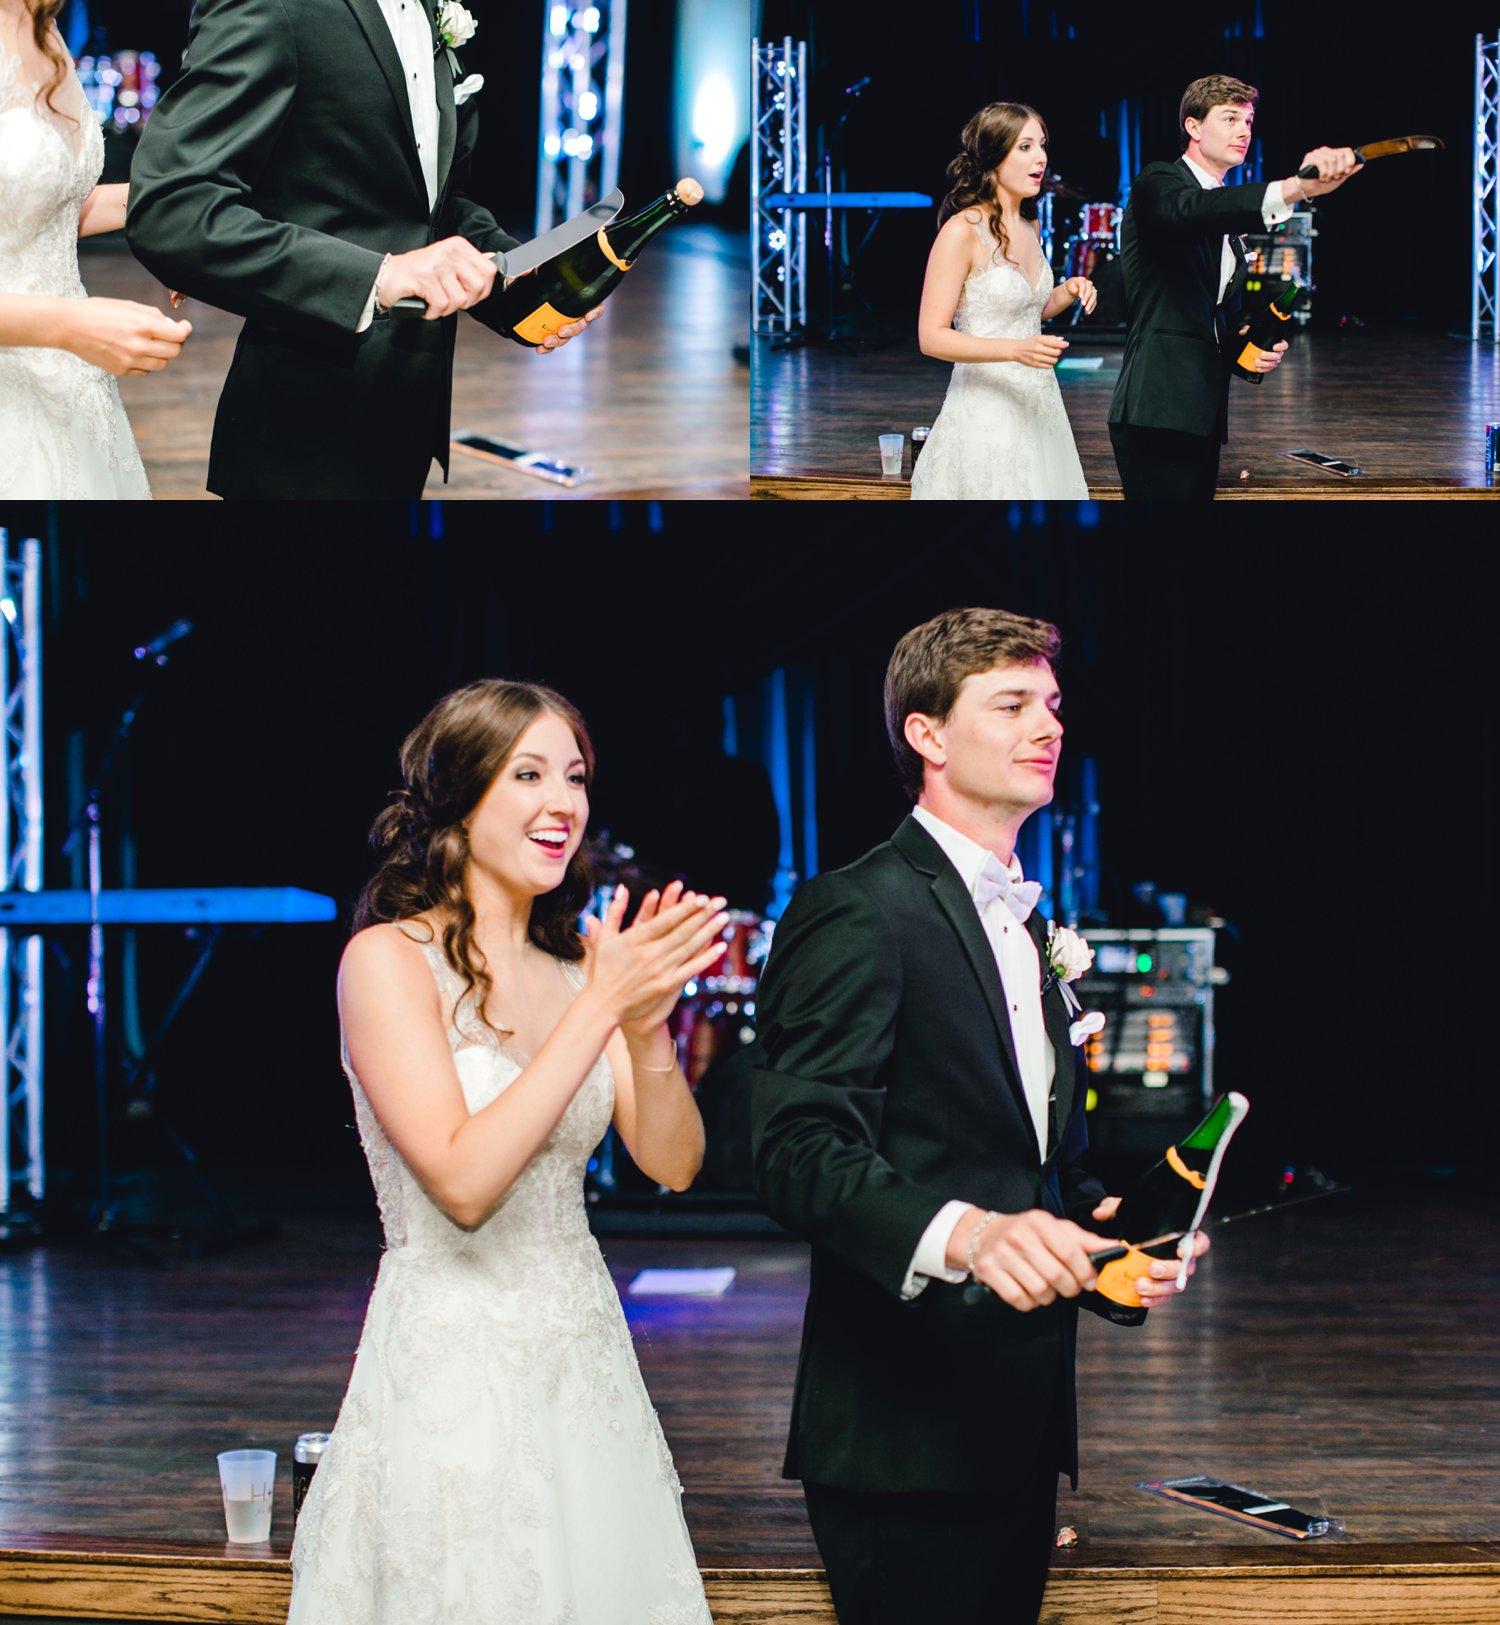 Hunter_and_Molly_Rawls_ALLEEJ_Lubbock_WEDDING_Legacy_Event_Center_0197.jpg